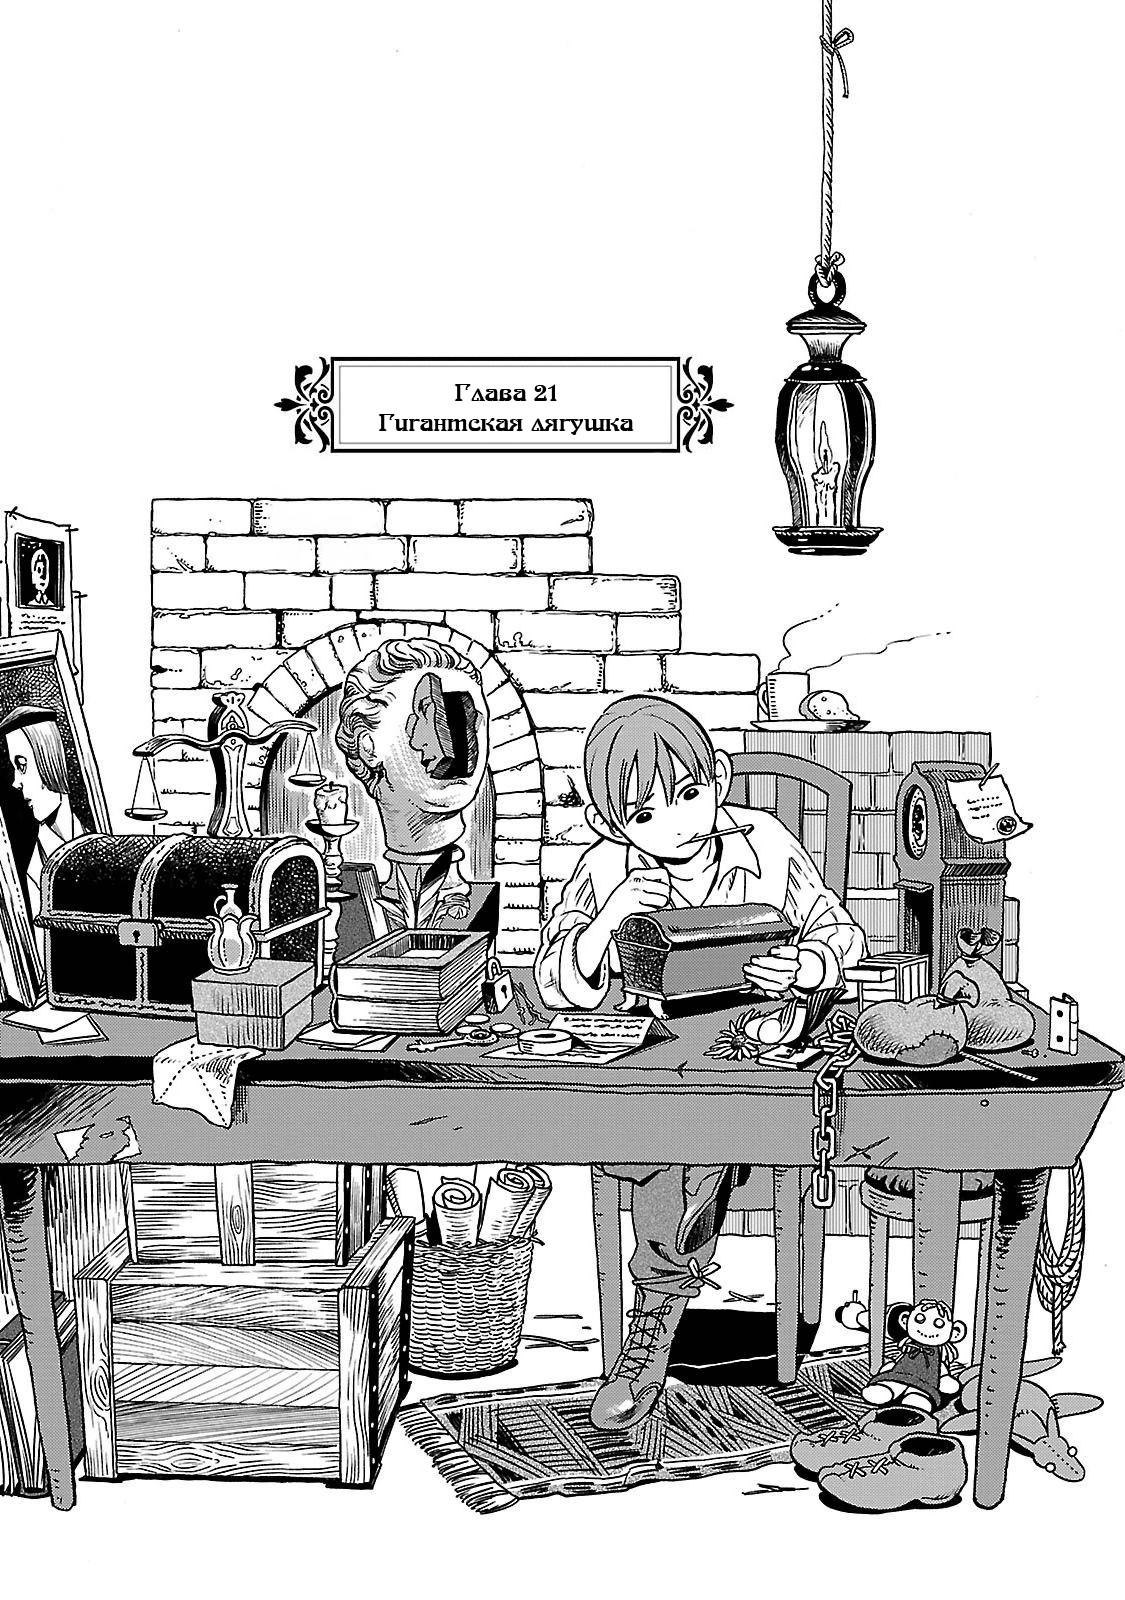 https://r1.ninemanga.com/comics/pic2/50/27634/1121979/1540509574212.jpg Page 1